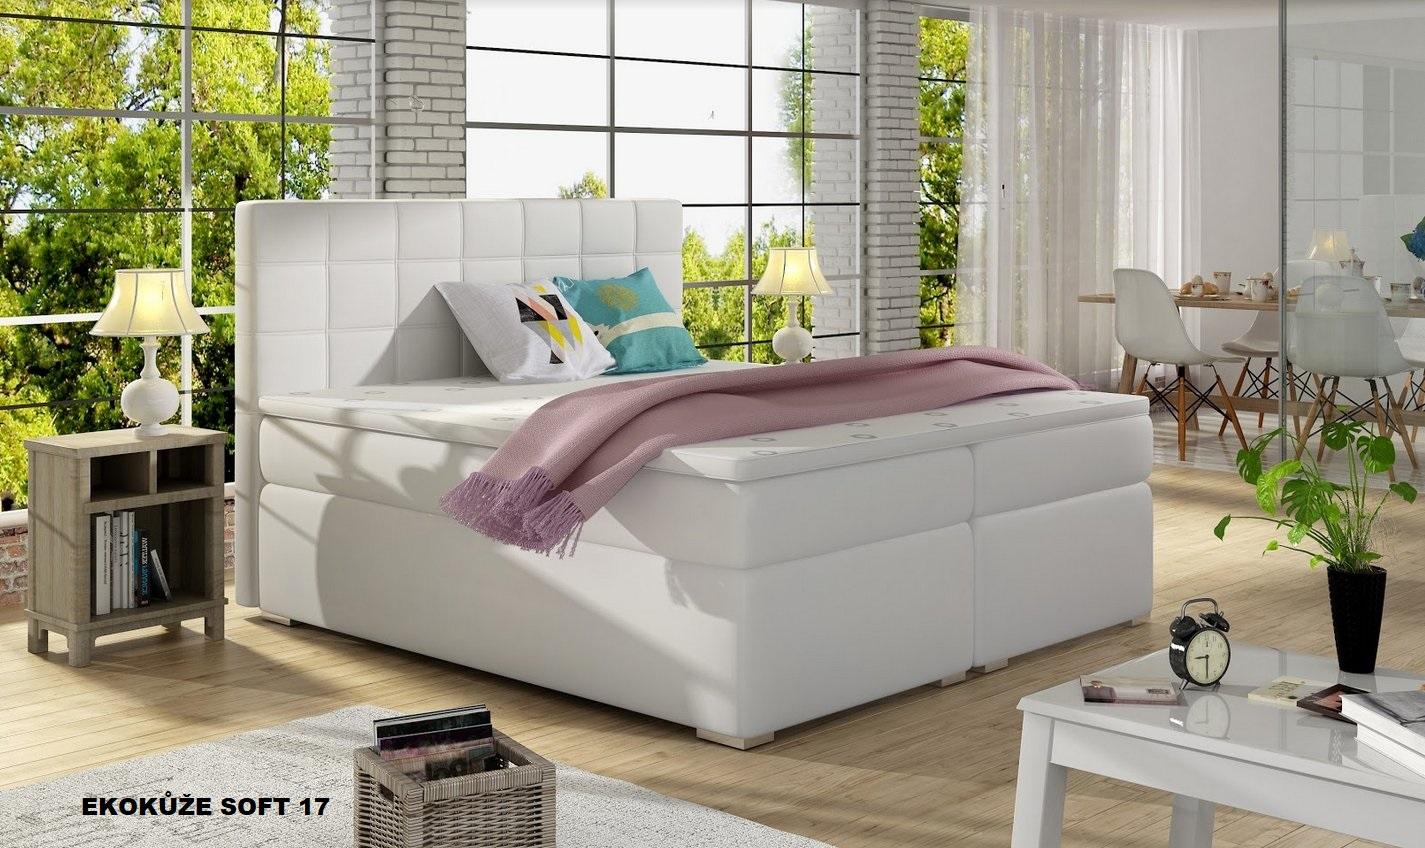 postele boxspring 180x200 boxspring aldo 180 200. Black Bedroom Furniture Sets. Home Design Ideas